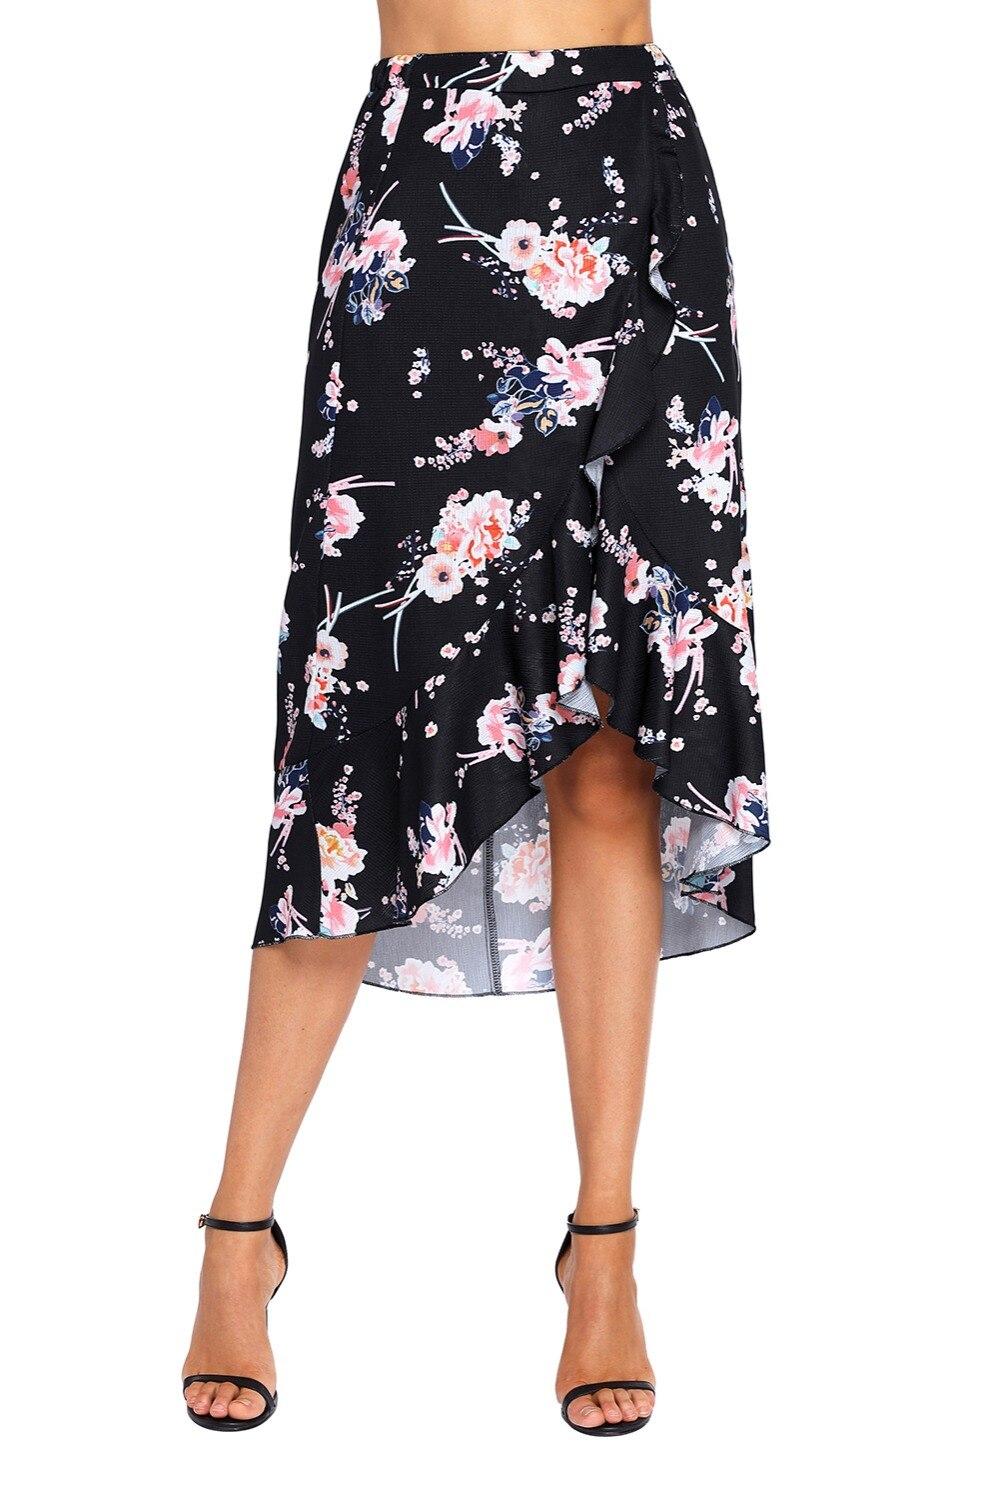 3796545eb5301 Women Vintage Floral Ruffle Wrap Skirt High Waist Black Pink ...